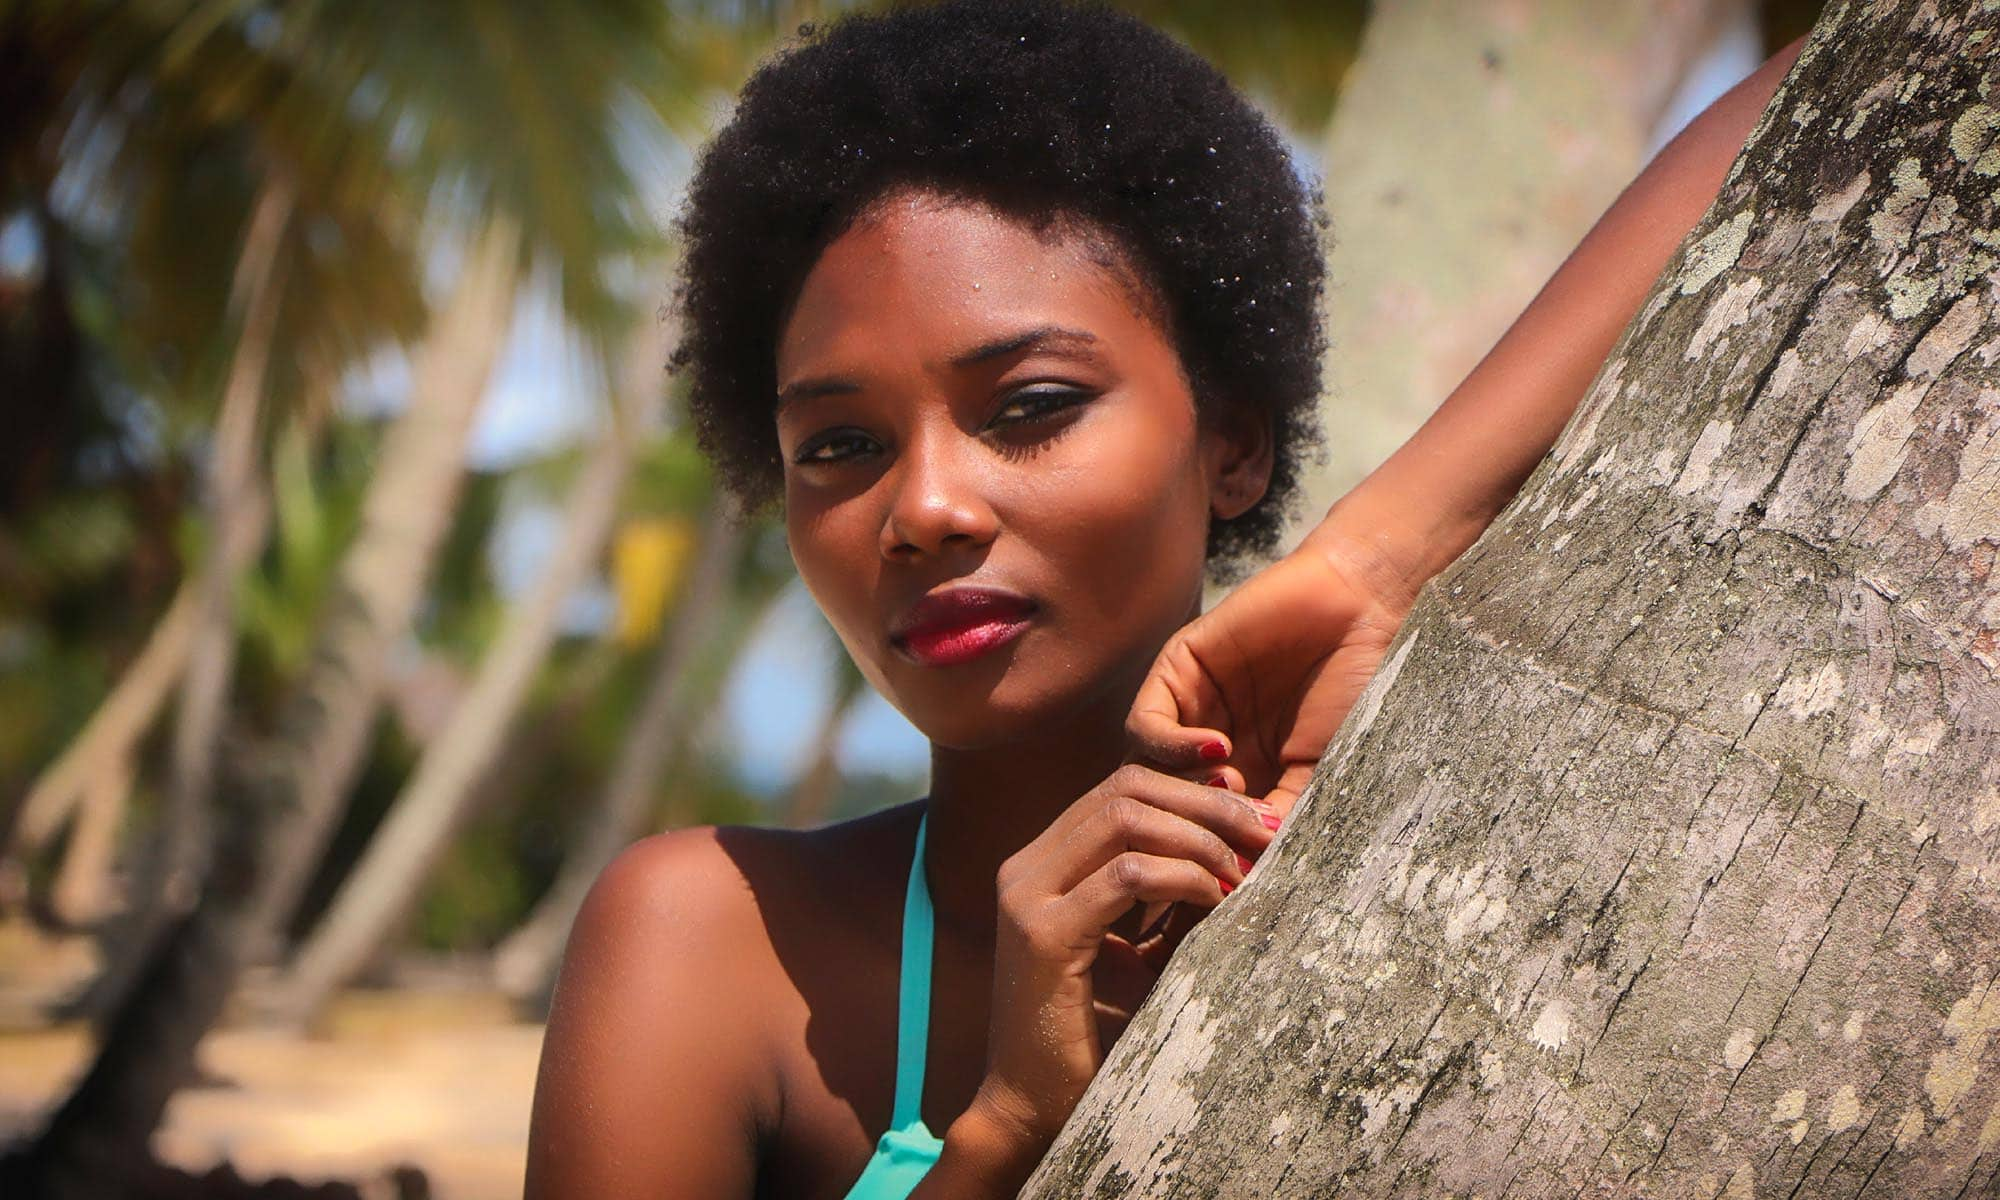 femme-africaine-modele-plage-cocotier